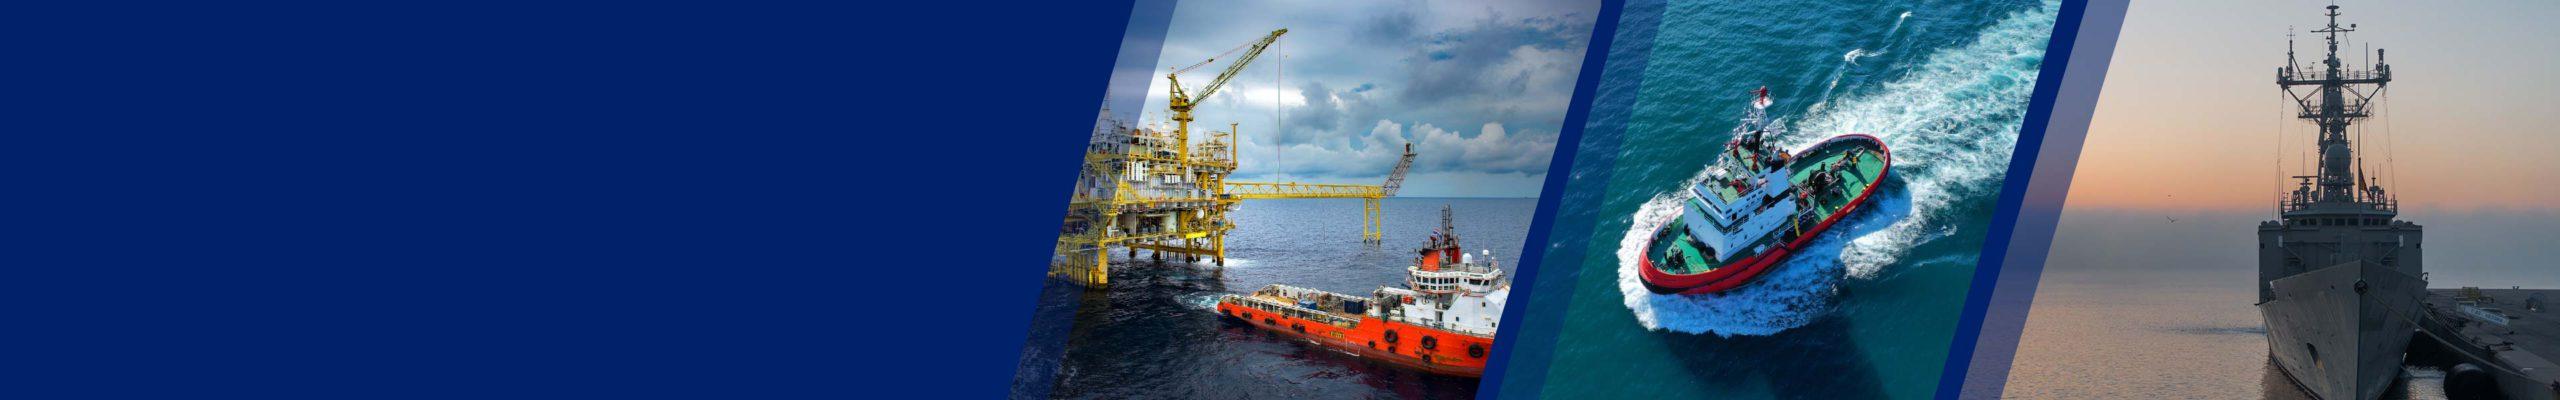 Seacoast   Naval & Shipboard